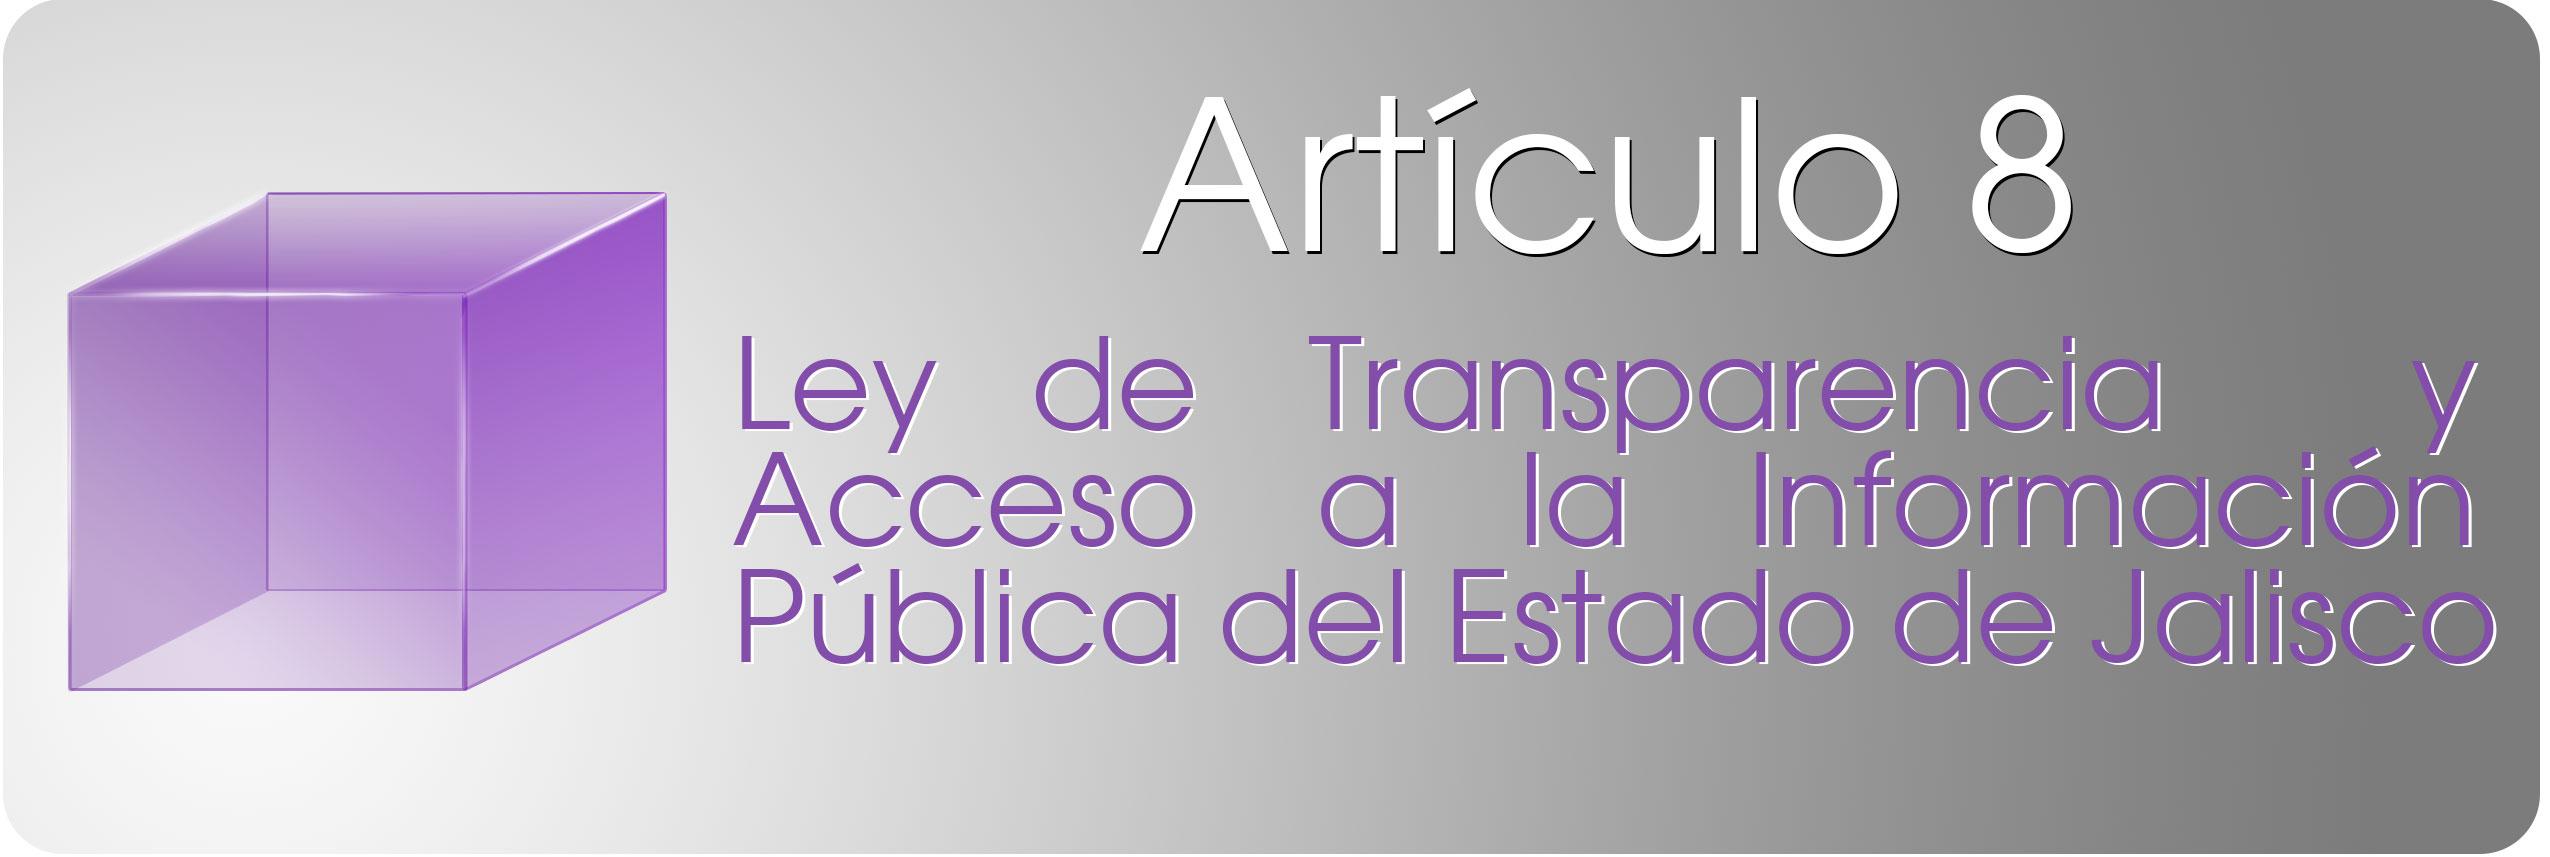 articulo-8-transparencia